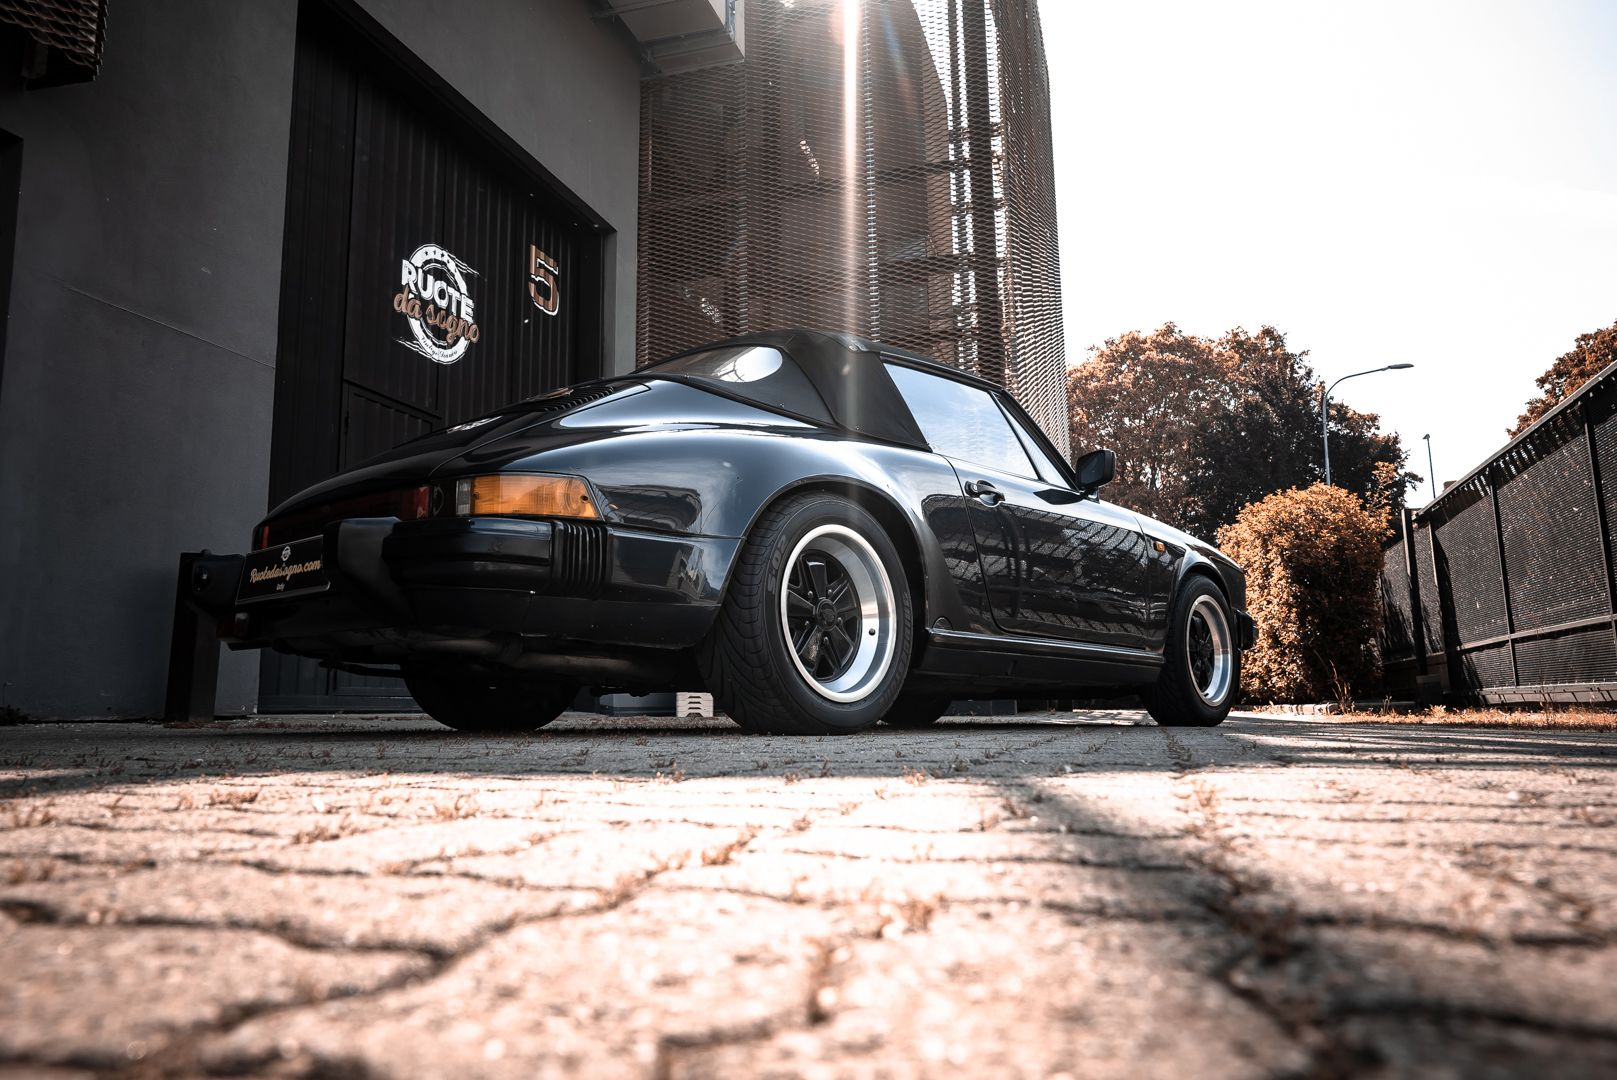 1986 Porsche 911 Carrera 3.2 Cabrio 70901